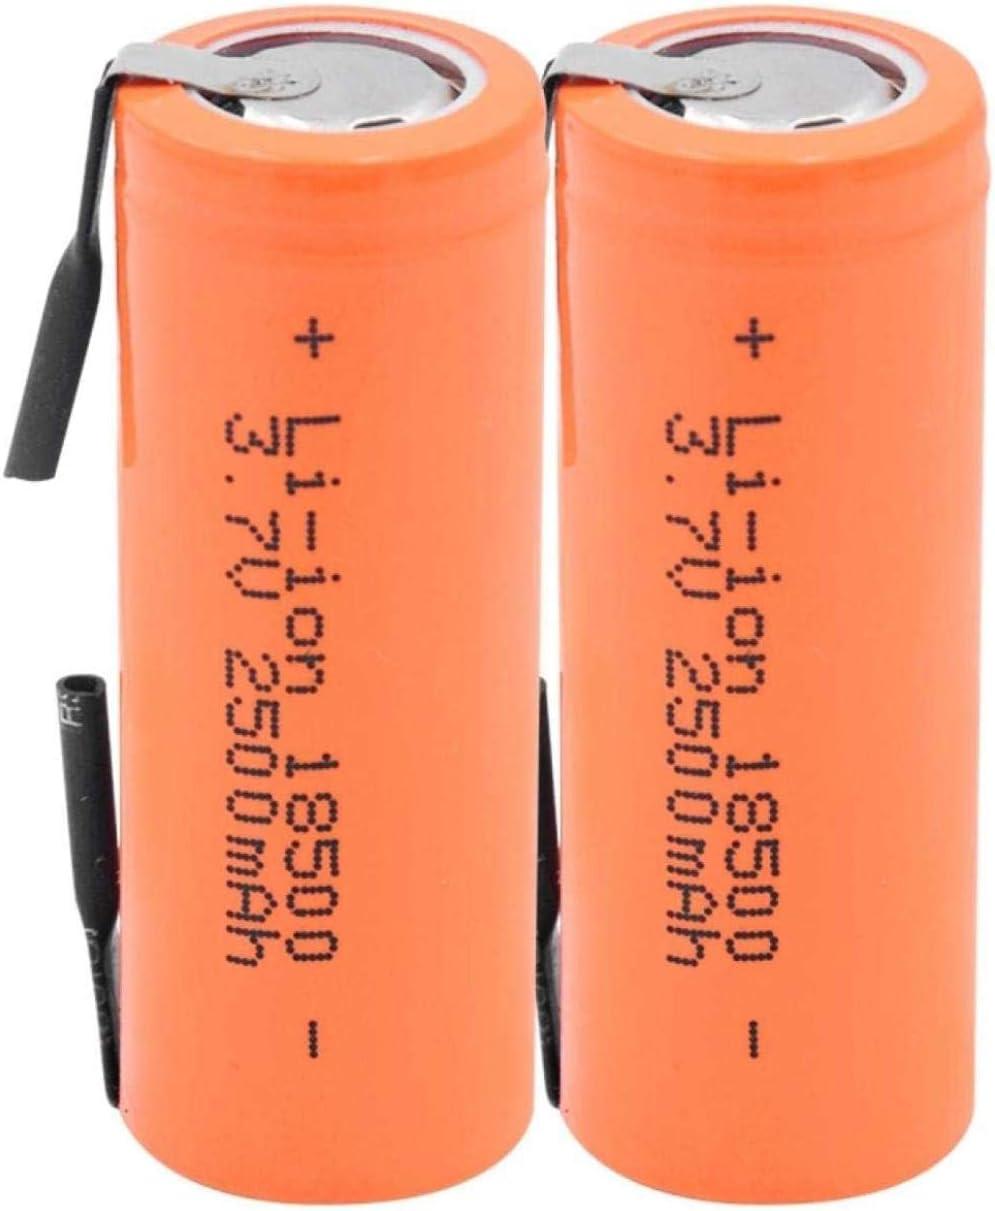 Rechargeable security Battery Philadelphia Mall 18500 LithiumIon Li 3.7V 2500Mah